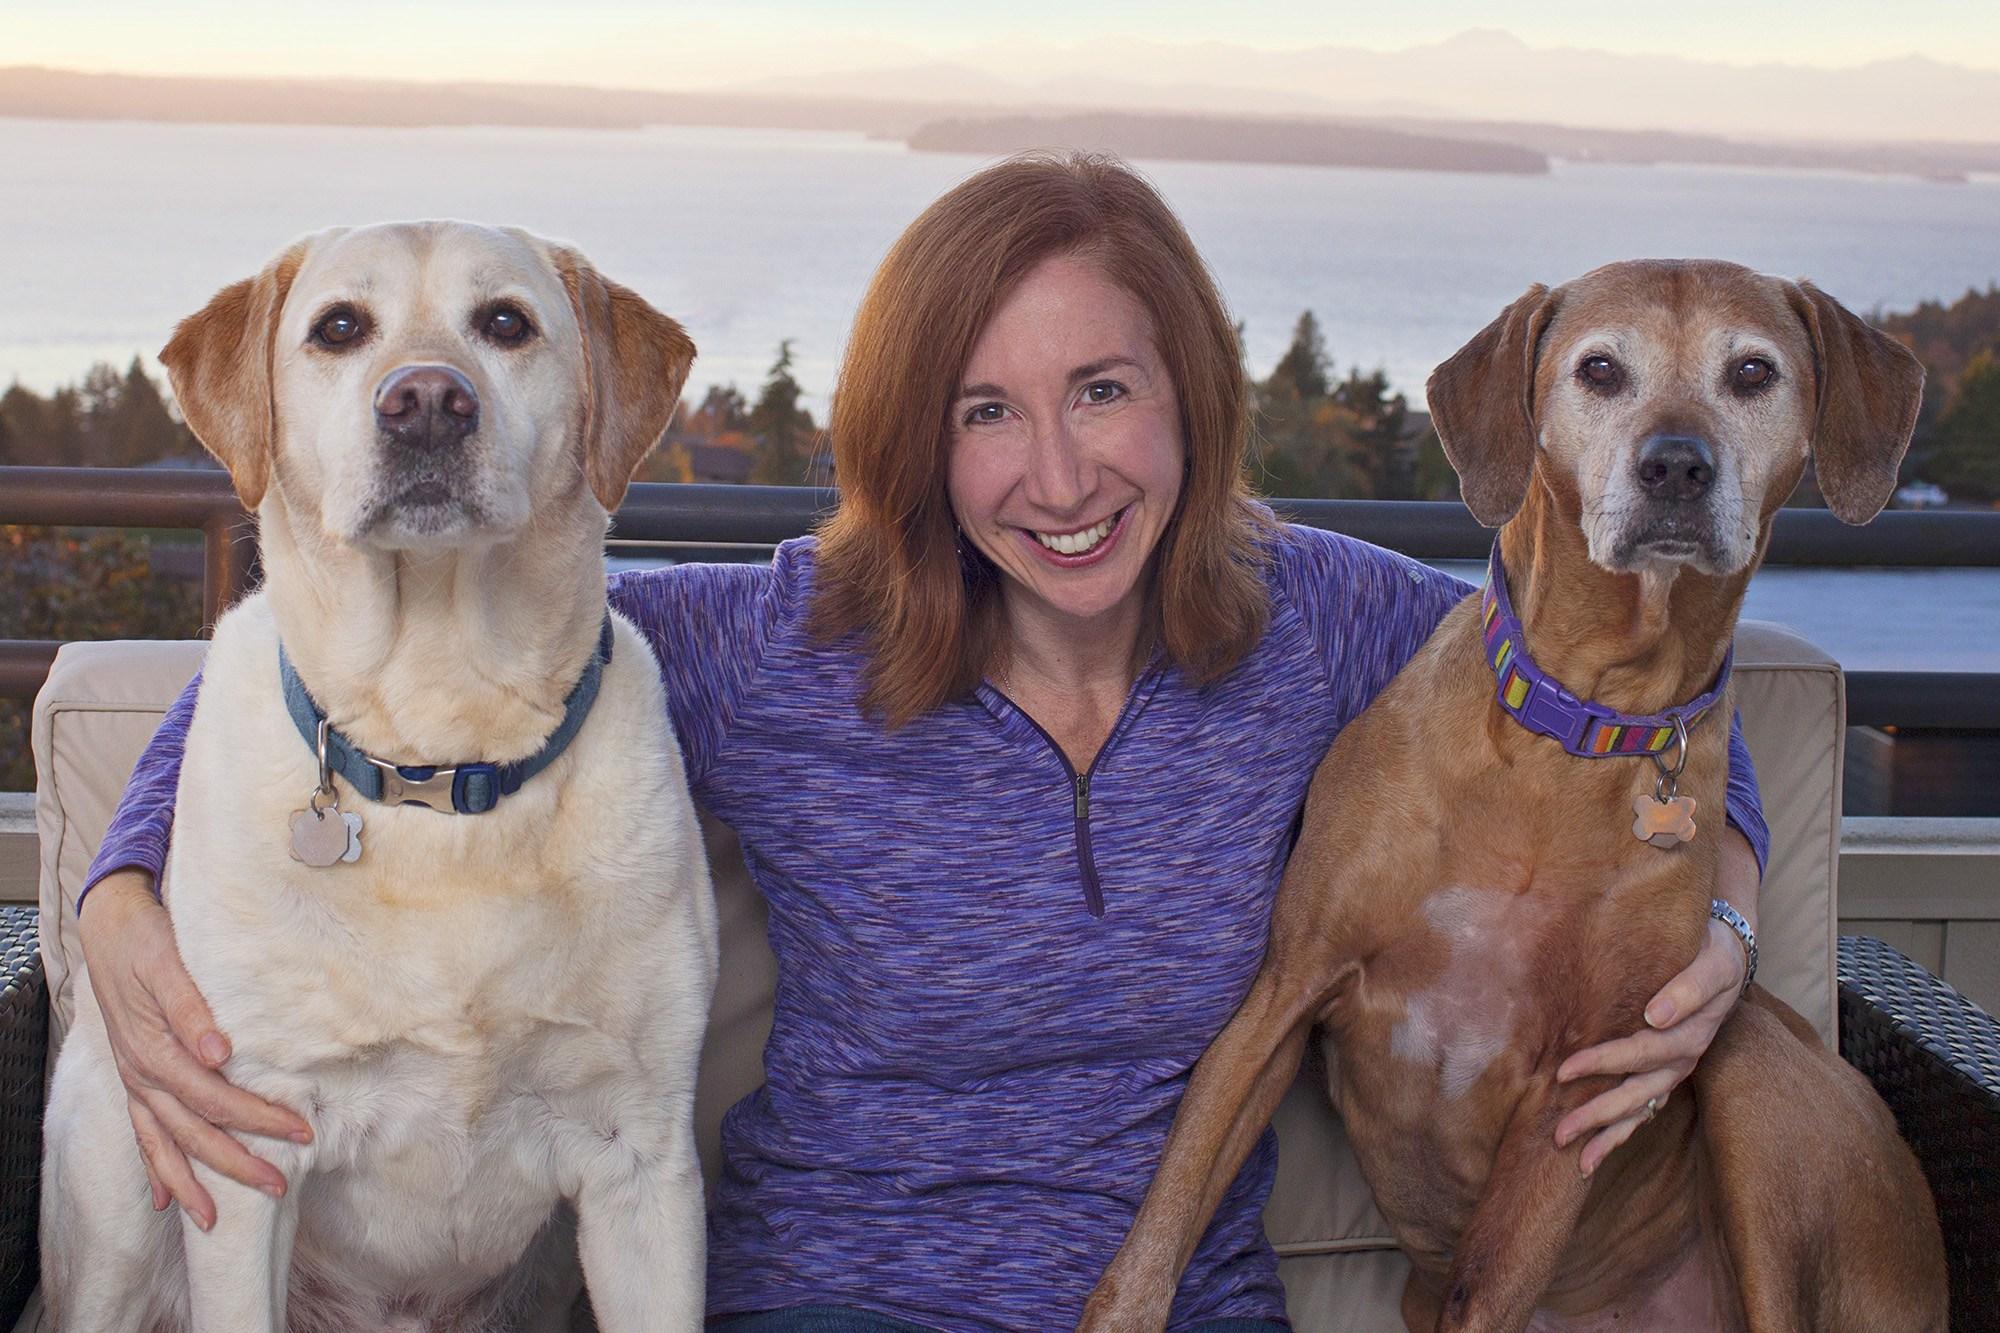 Coffey Time With NBC TODAY com's Laura & Senior Pets - Goodnewsforpets